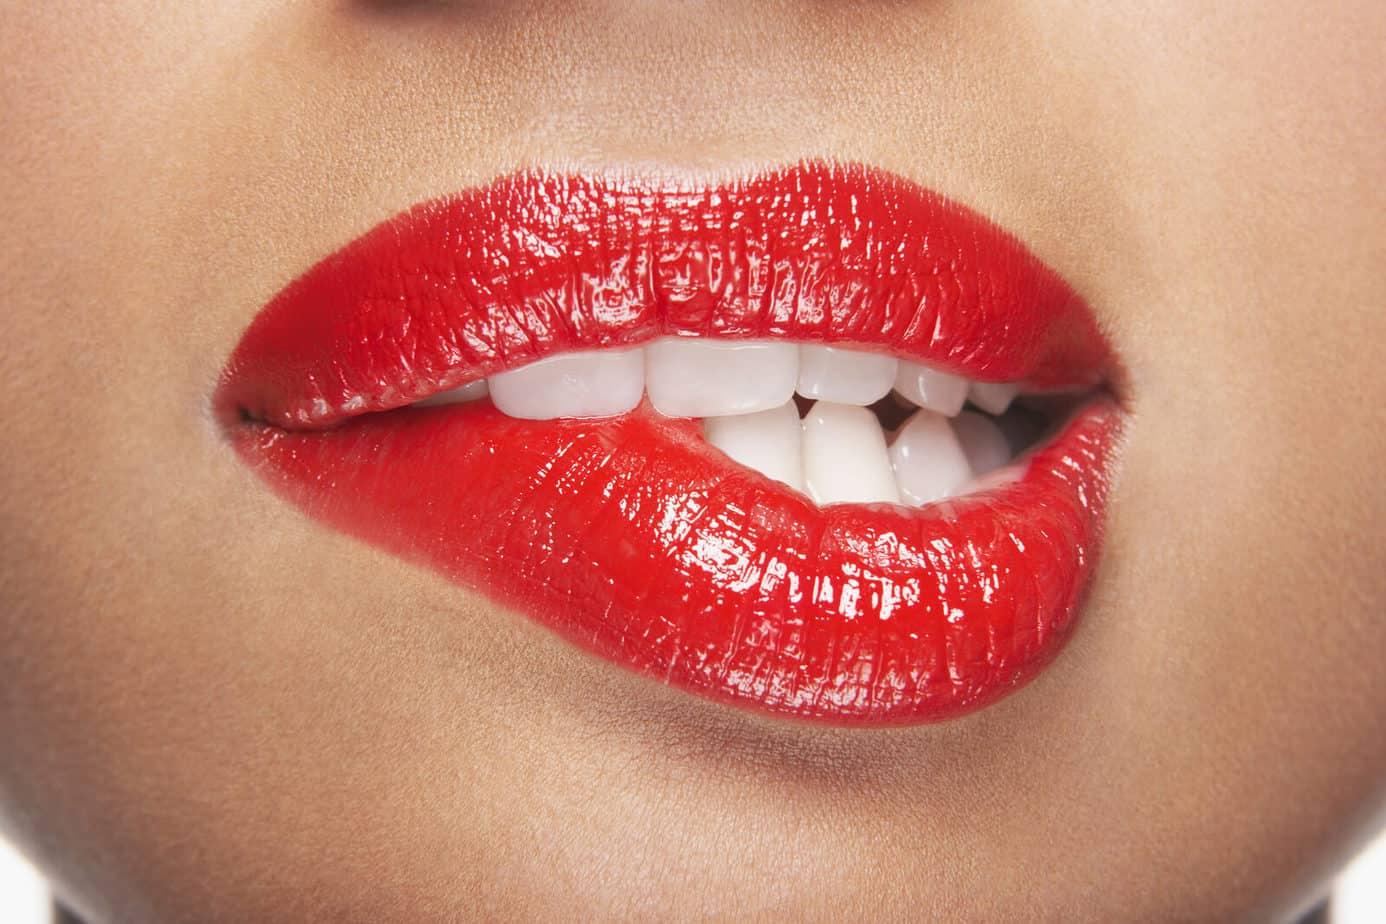 Why do girls bite their lips